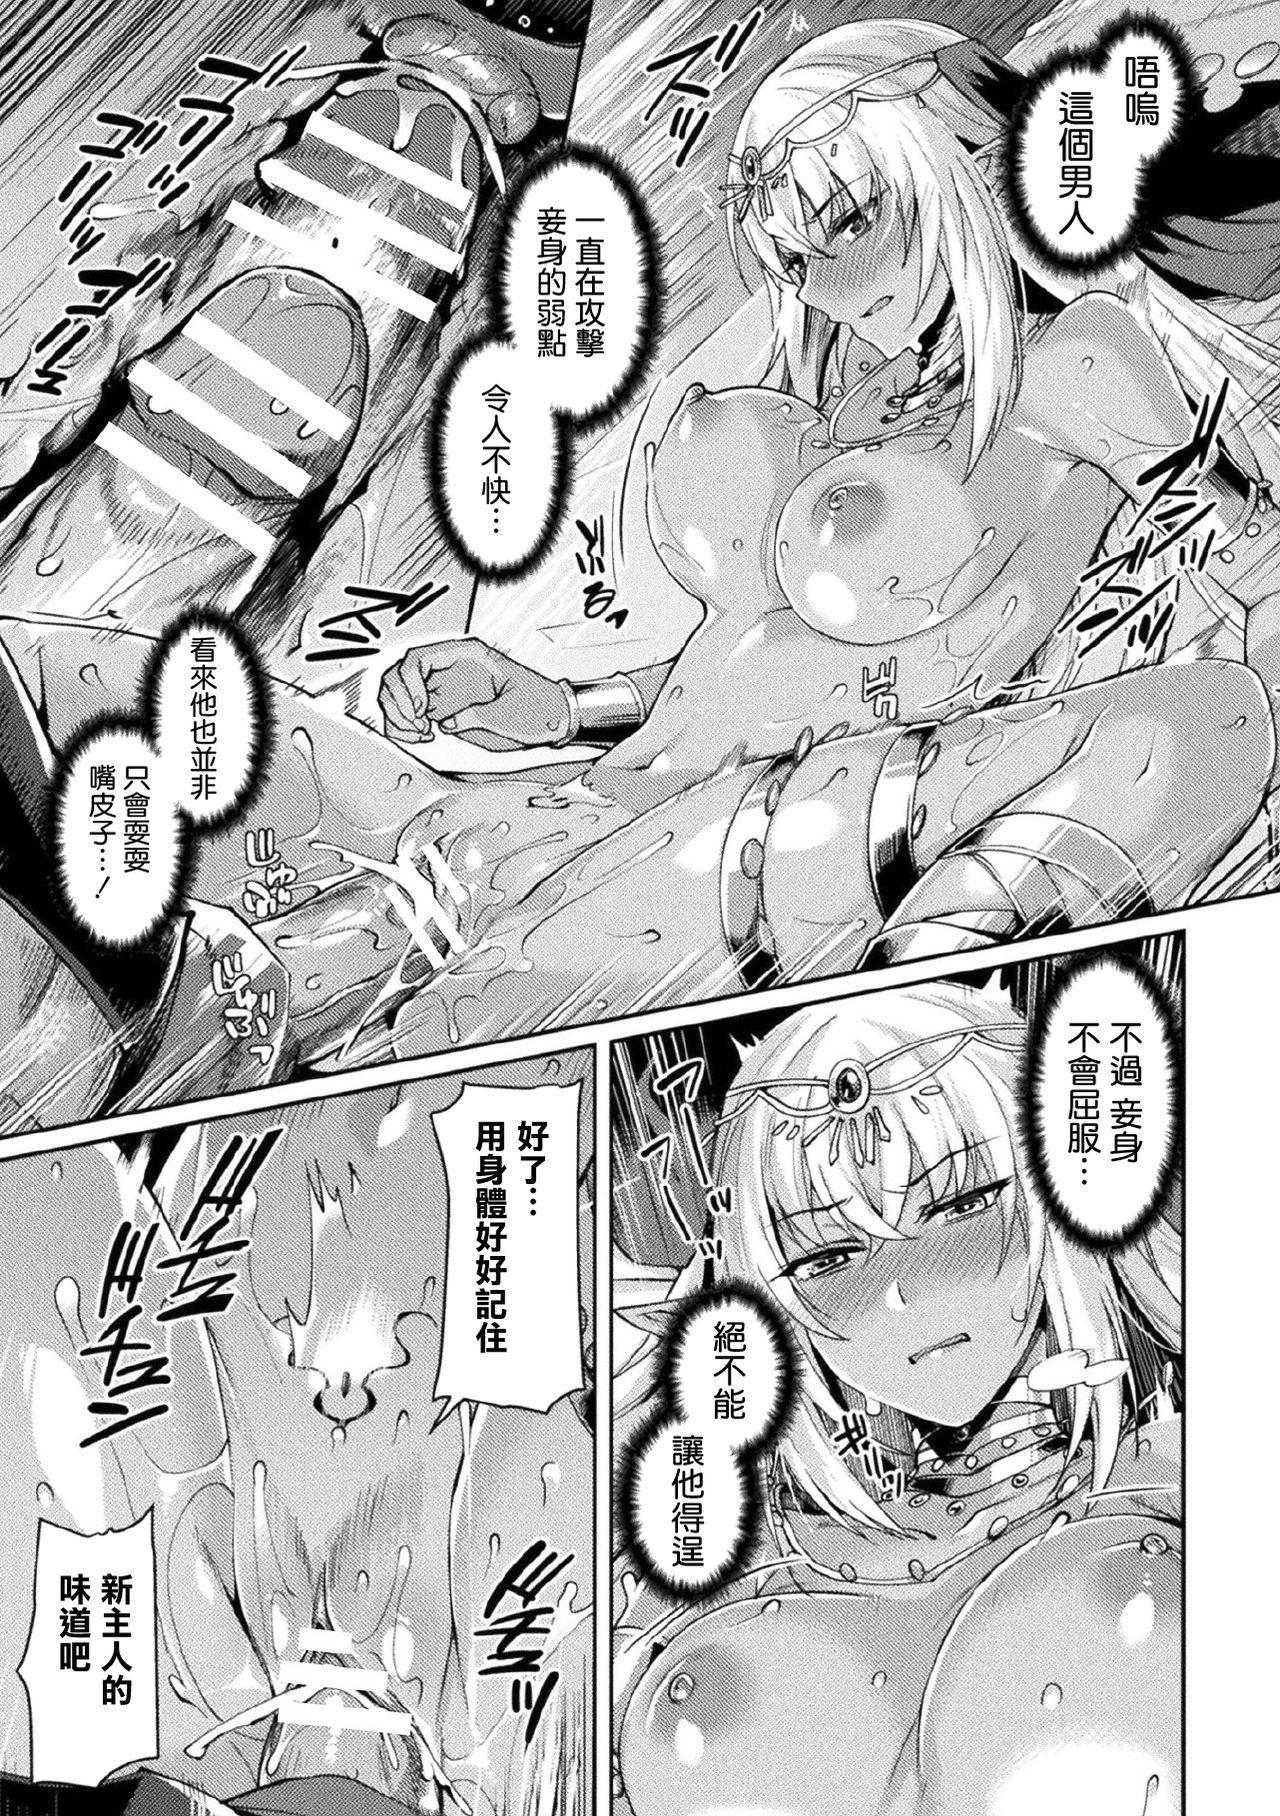 [Tsukitokage] Kuroinu II ~Inyoku ni Somaru Haitoku no Miyako, Futatabi~ THE COMIC Chapter 6 (Kukkoro Heroines Vol. 7) [Digital] [Chinese] [鬼畜王漢化組] [Digital] 15